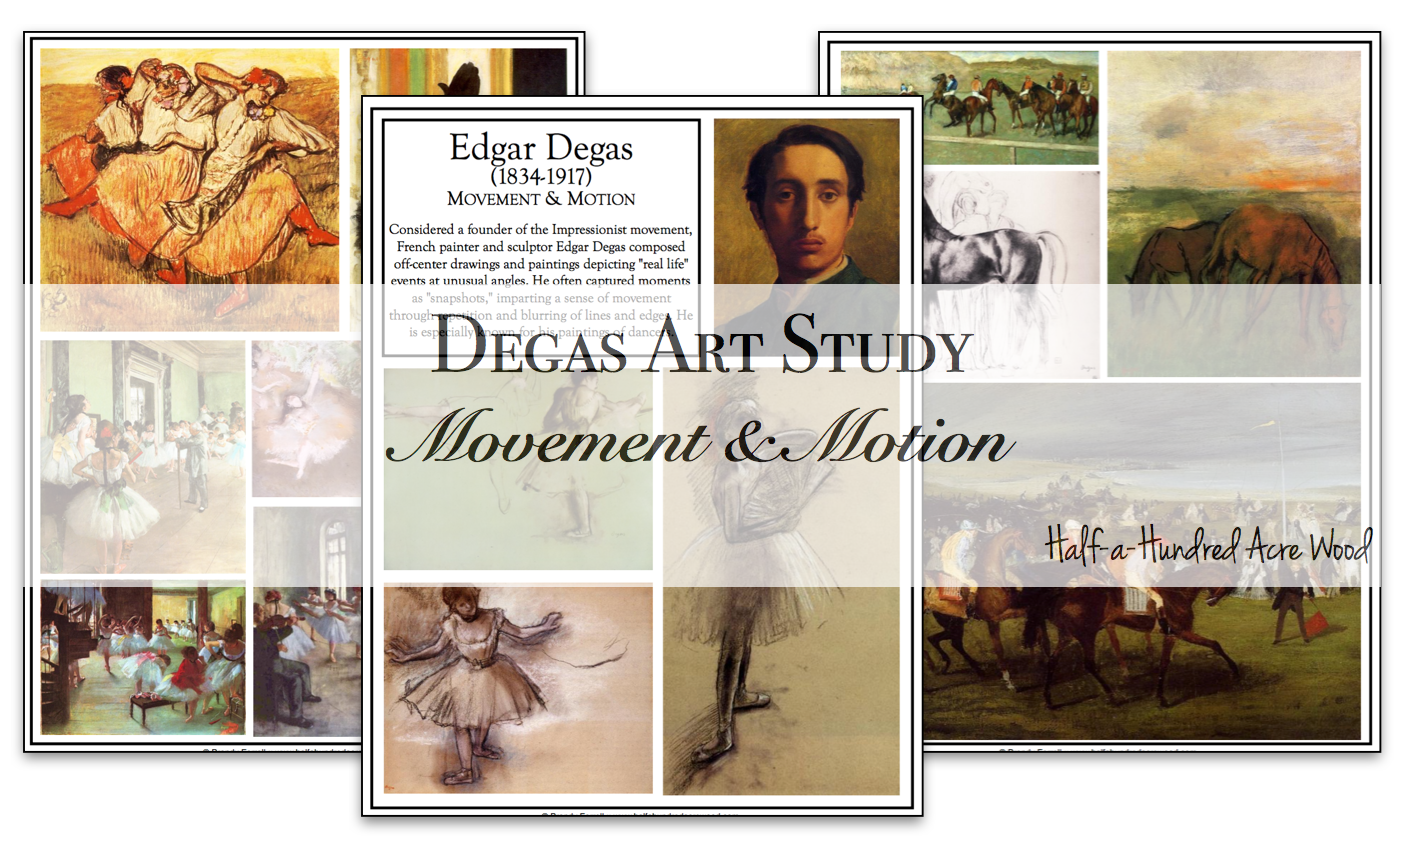 Degas Art Project Depicting Motion